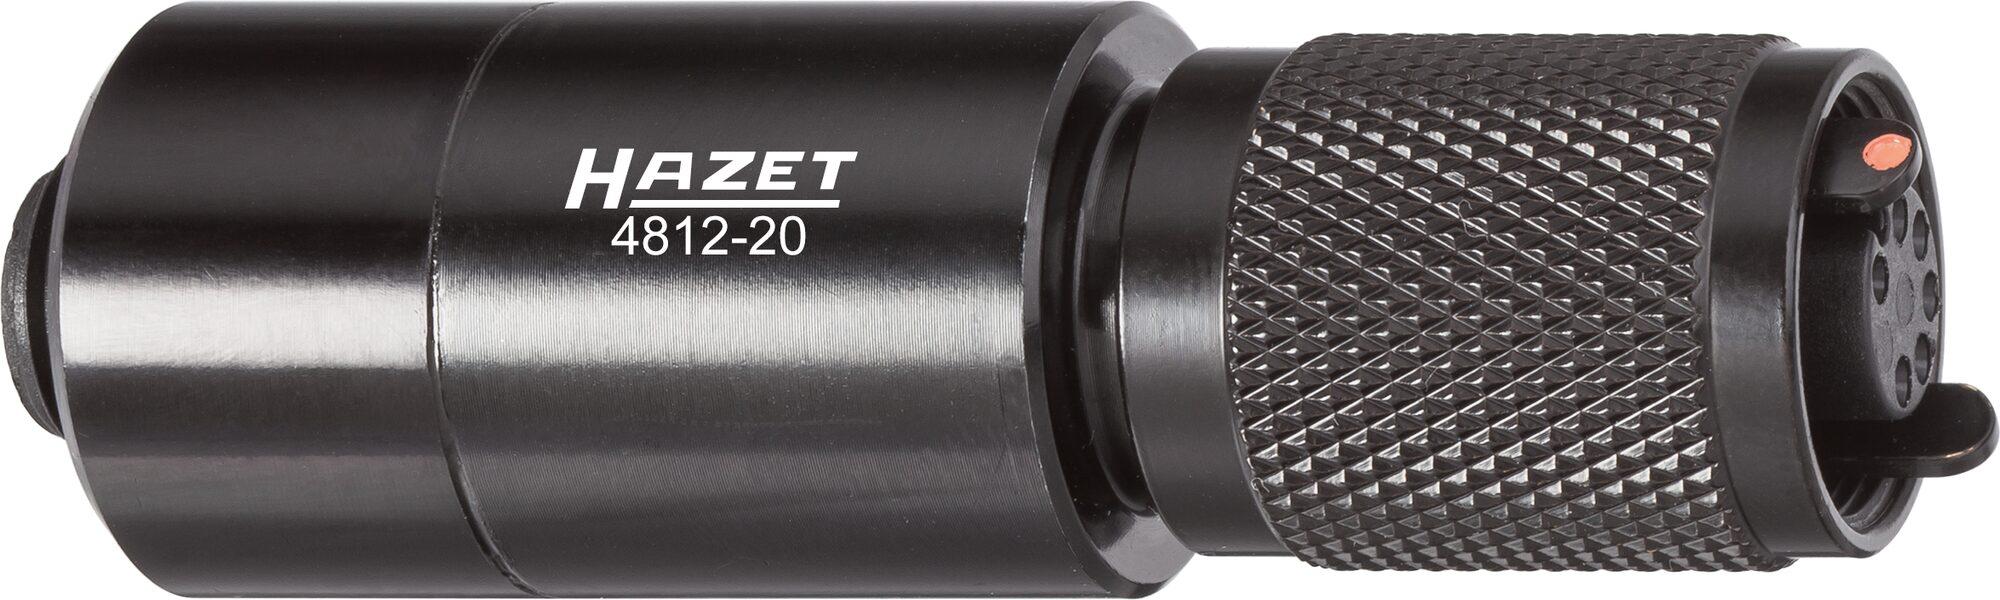 HAZET Sonden-Adapter 4812-20